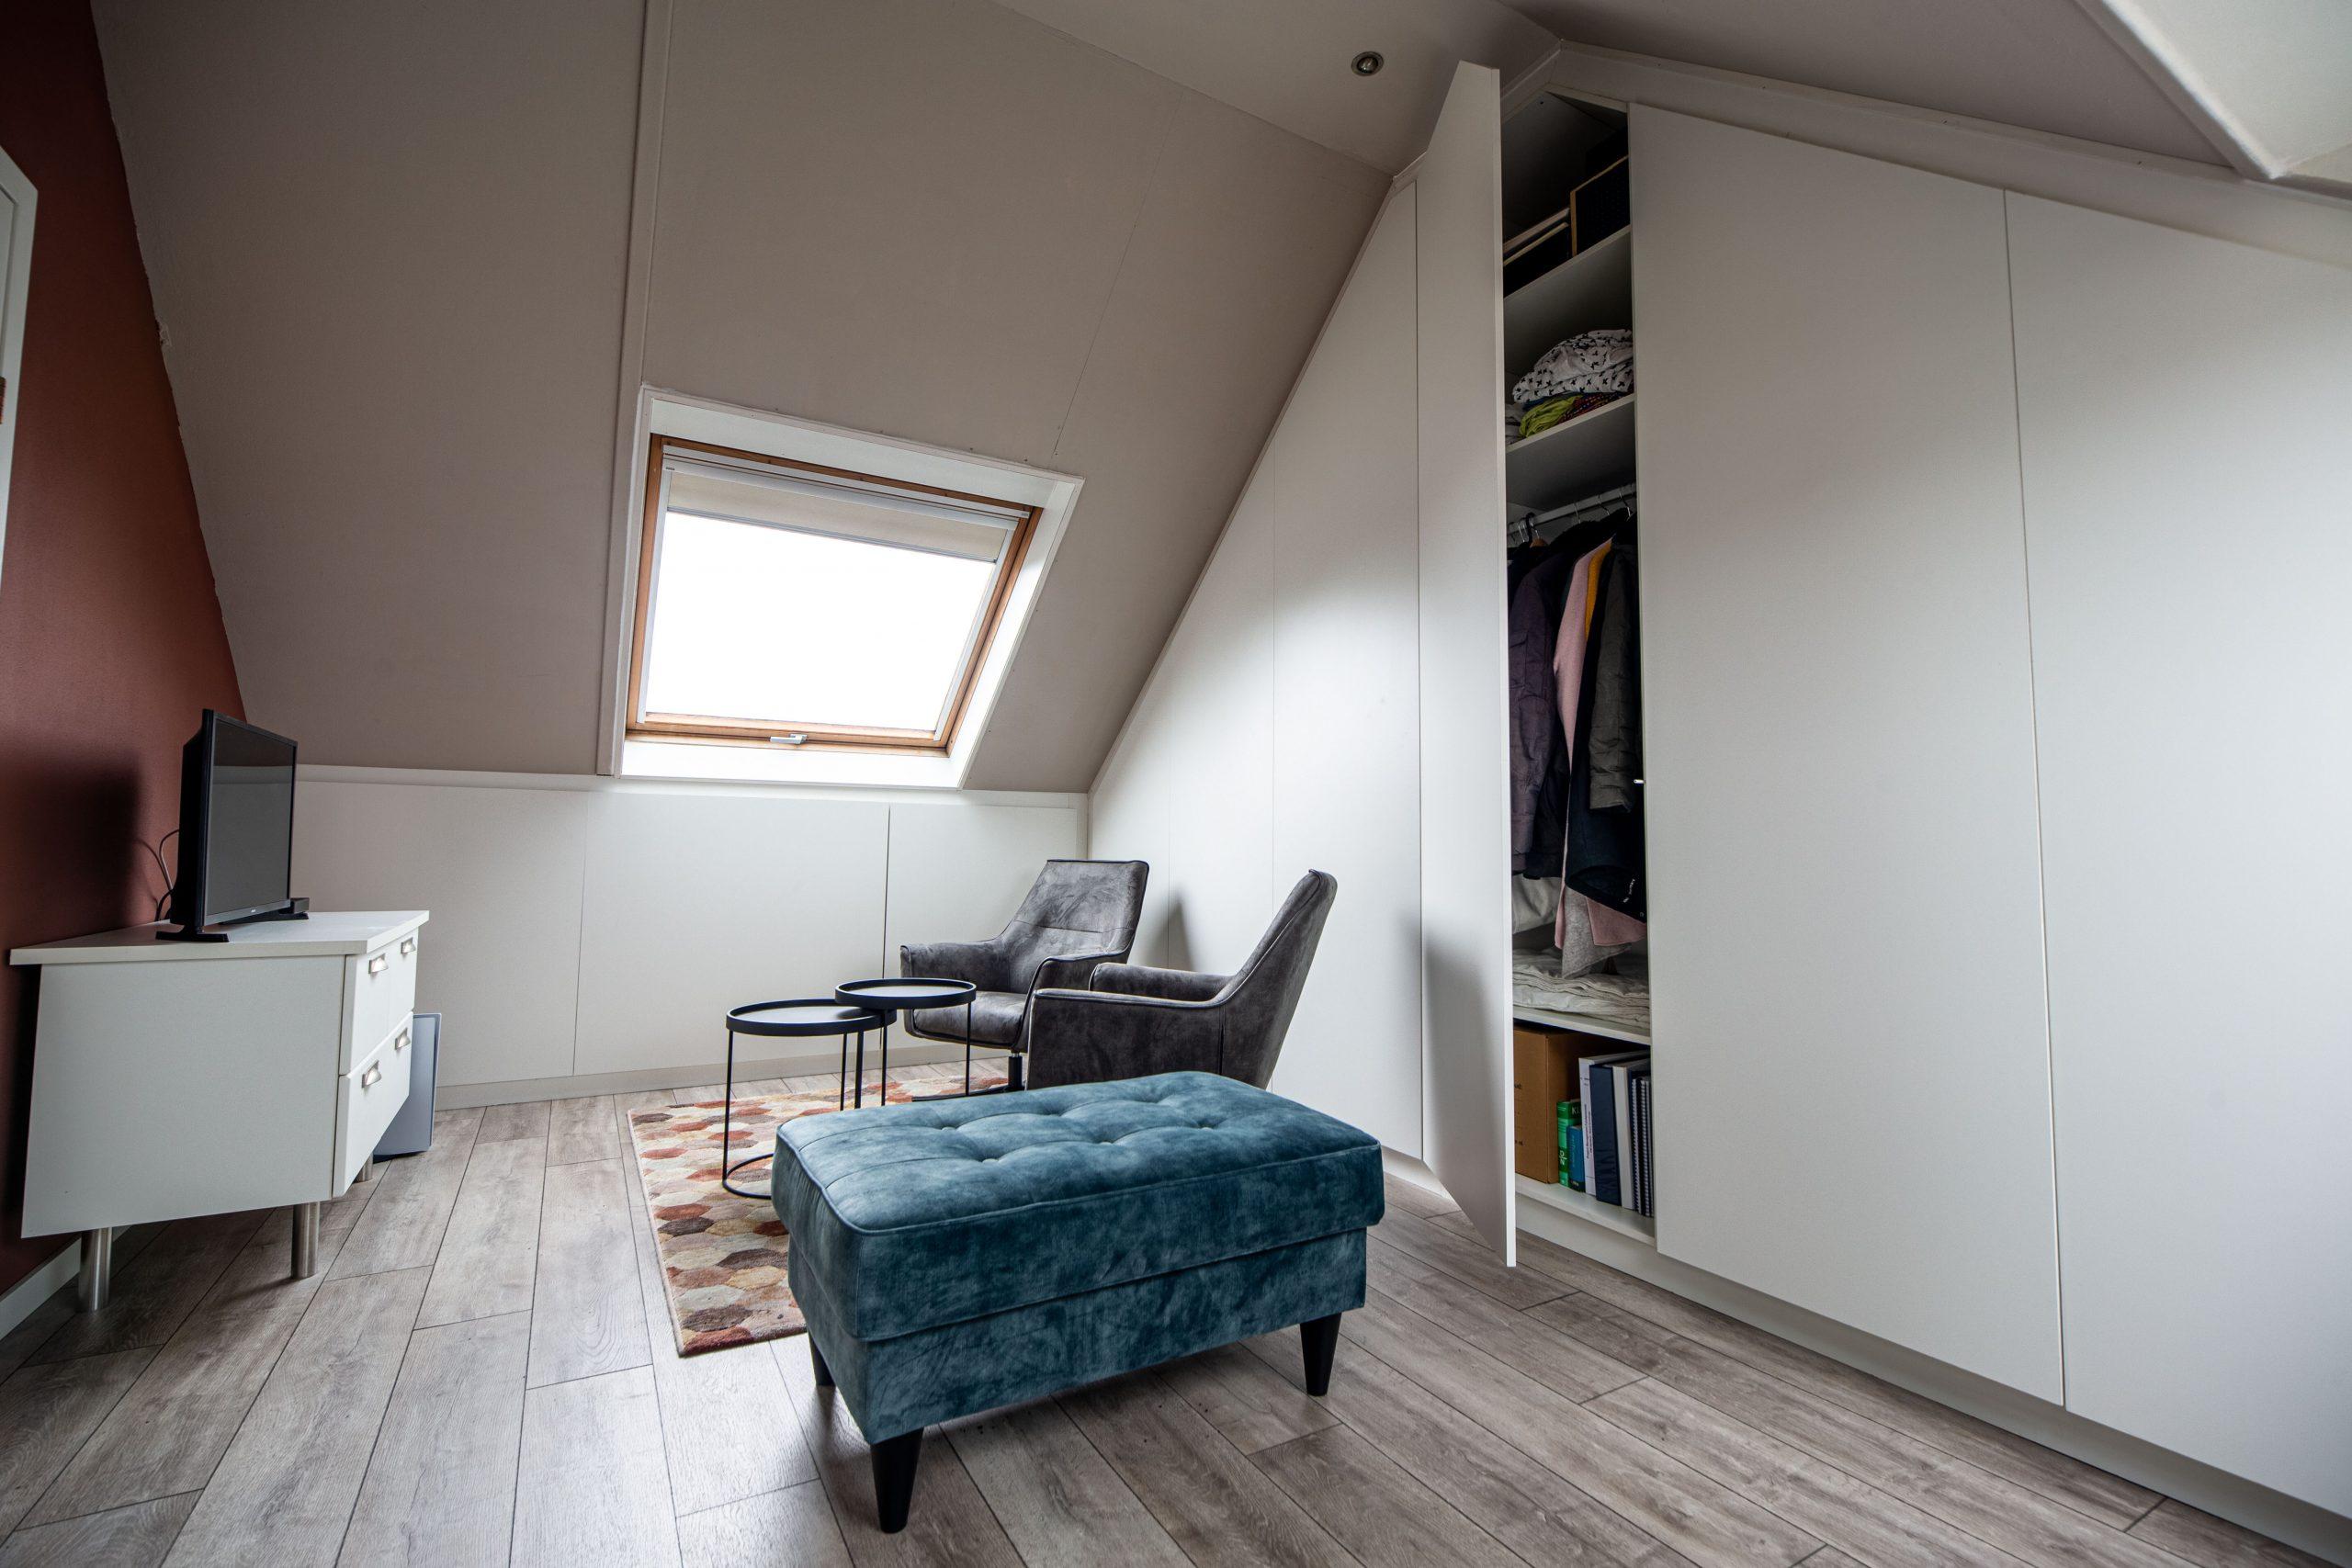 Sens Interieurs - thuiswerkplek op zolder - galerij6